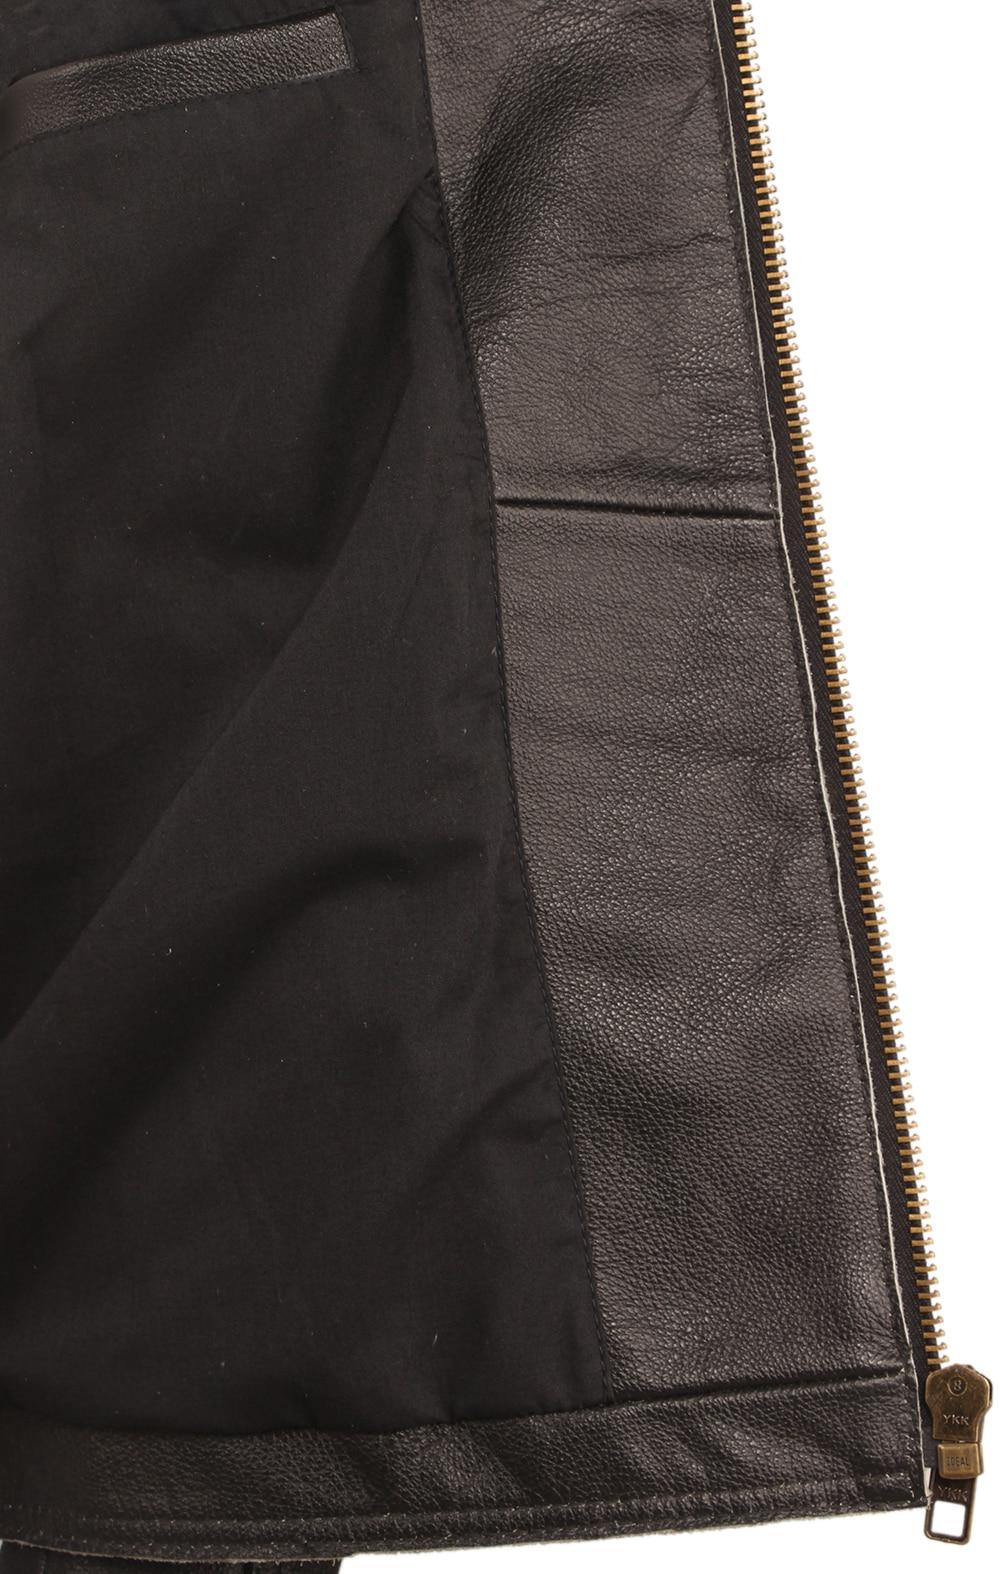 H36891a40bca94c22af4f8862951c4d66L Black Embroidery Skull Motorcycle Leather Jackets 100% Natural Cowhide Moto Jacket Biker Leather Coat Winter Warm Clothing M219